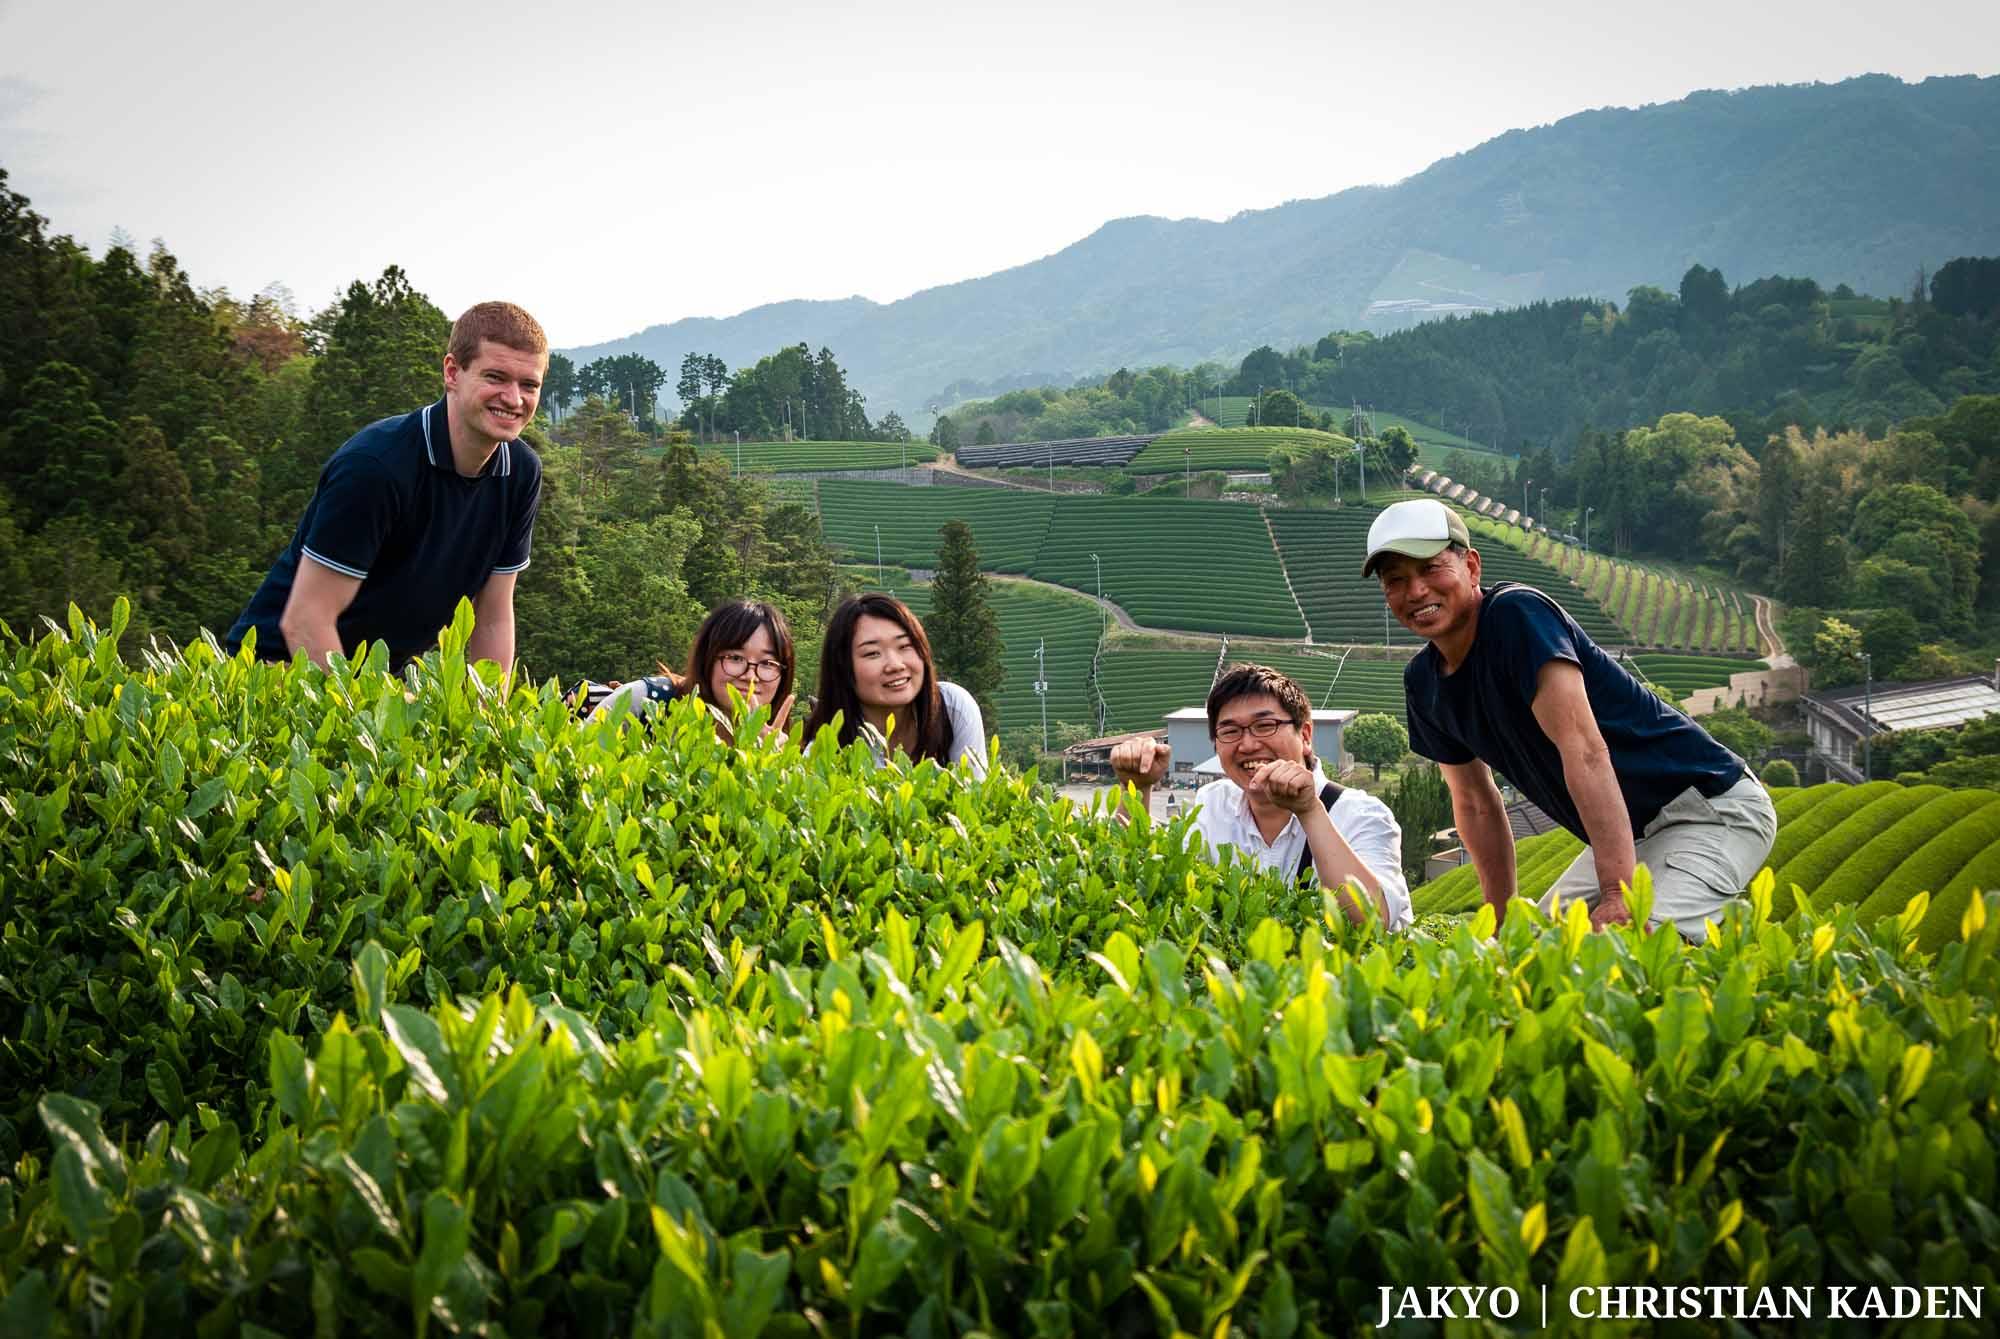 Tea fields in Wazuka, Japan / J2016, Japan, Kansai, Roten-en, Tea, Tea Plantation, Tee, Teeplantage, Wazuka, offenes Teefeld, open tea field, 和束町, 日本, 茶, 茶園, 茶畑, 関西, 露天園